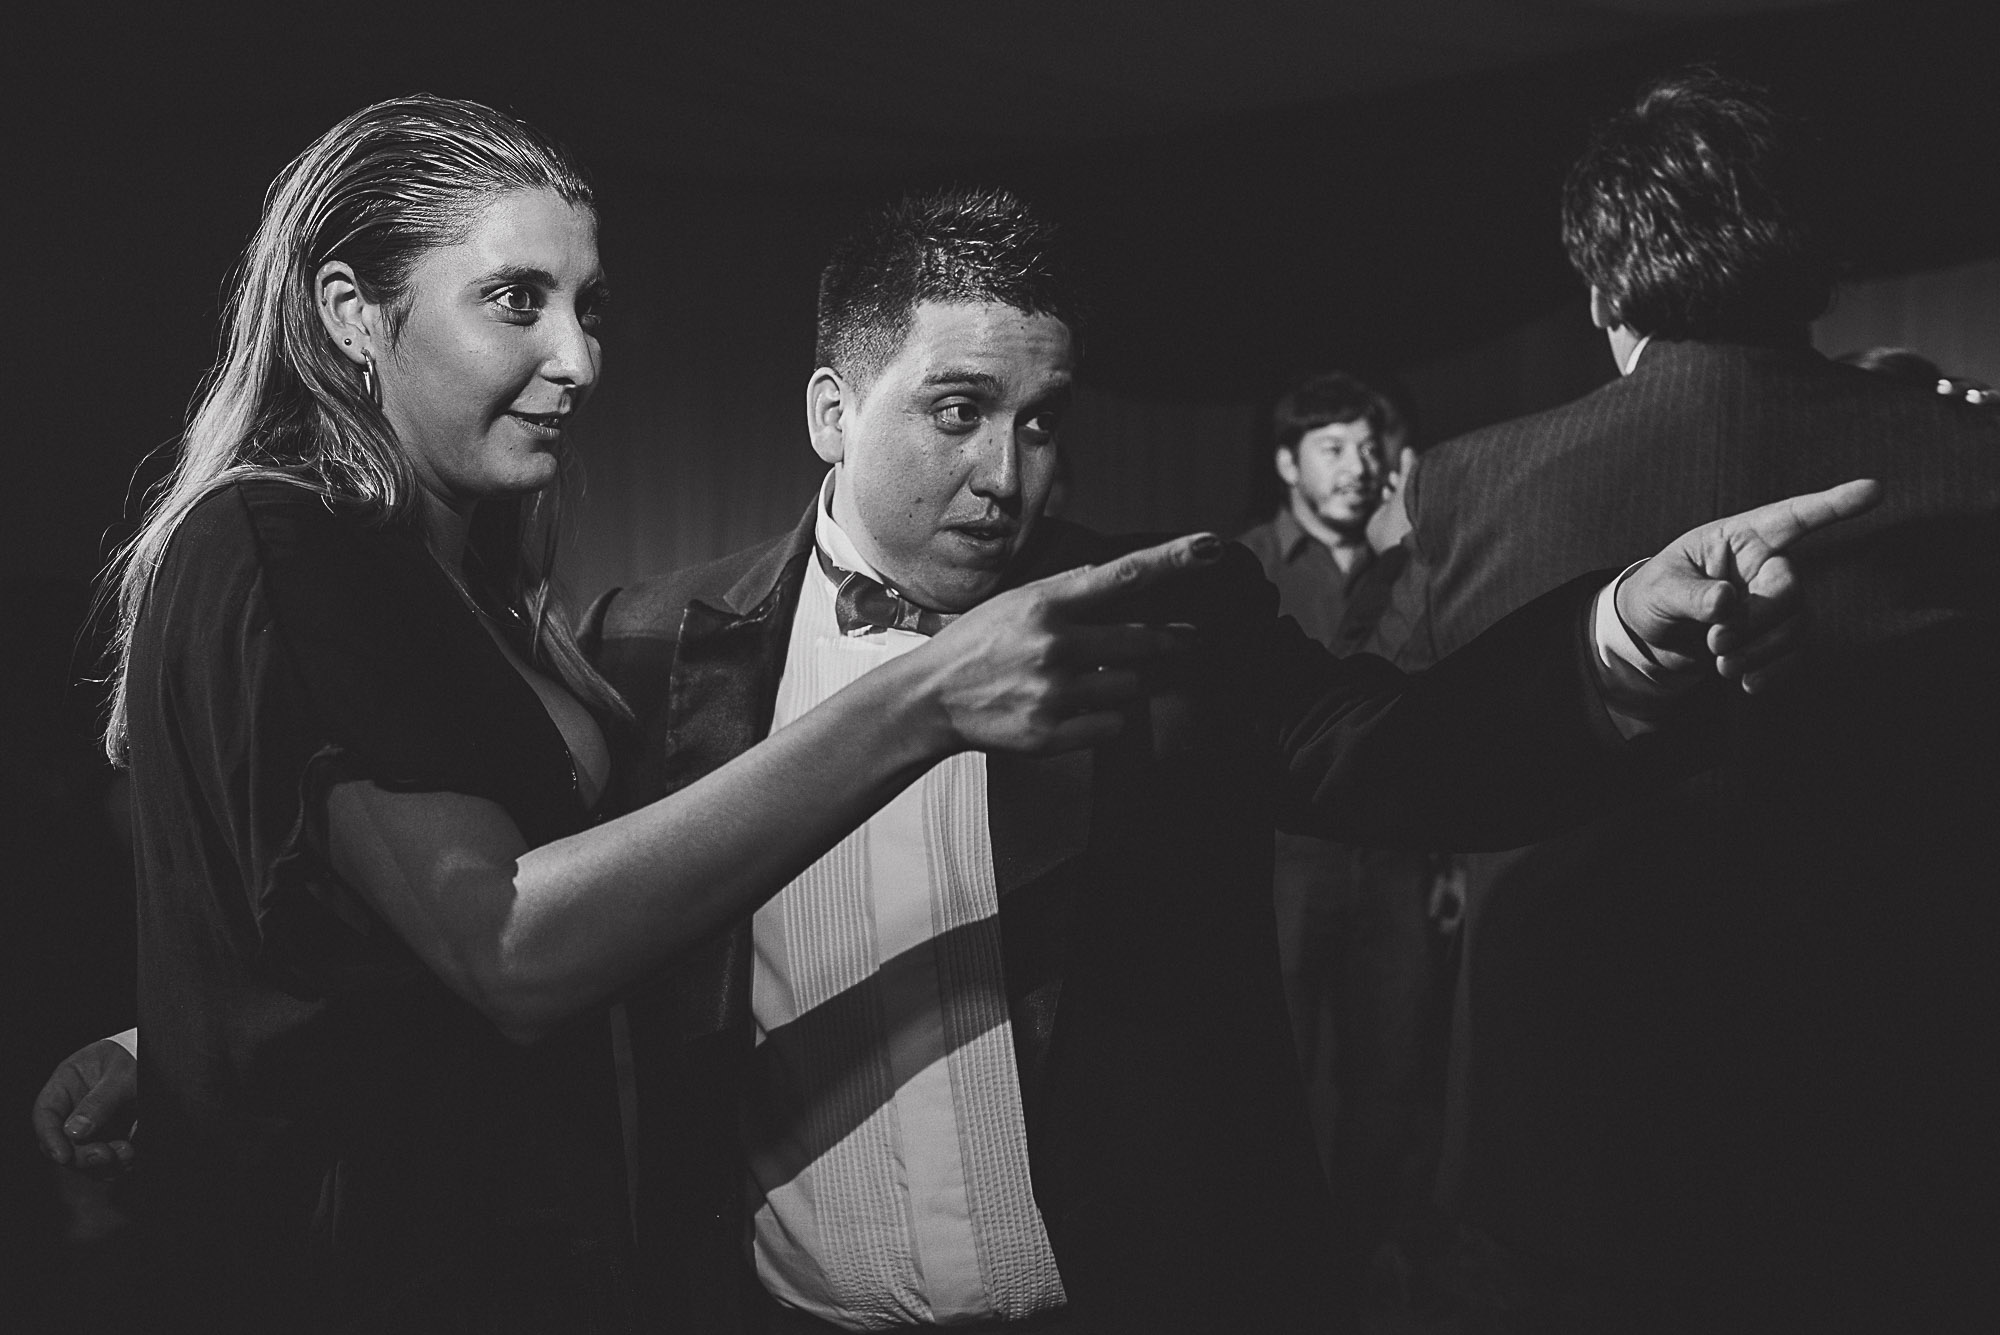 boda-vero-raul-patagonia-argentina-chilena-fotografo-de-bodas-argentina-casamiento-en-patagonia-gabriel-roa-photography-28